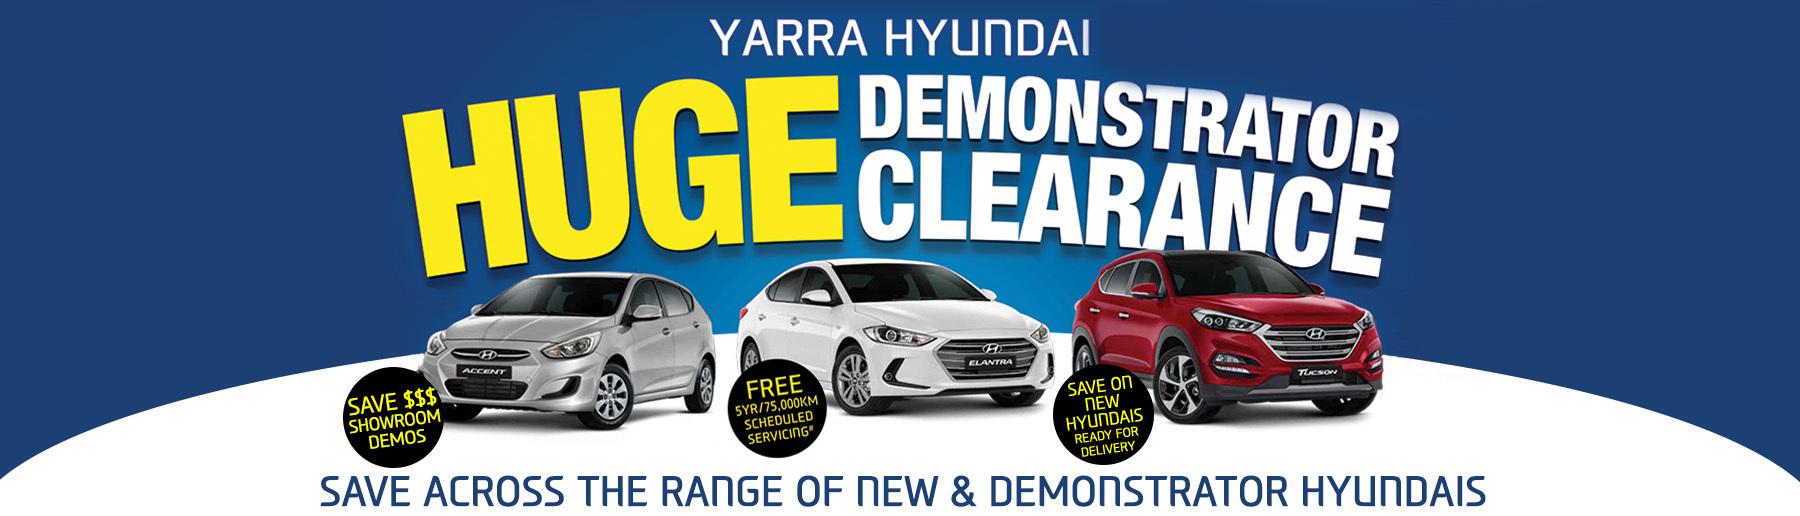 Yarra Hyundai Huge Demo Clearance